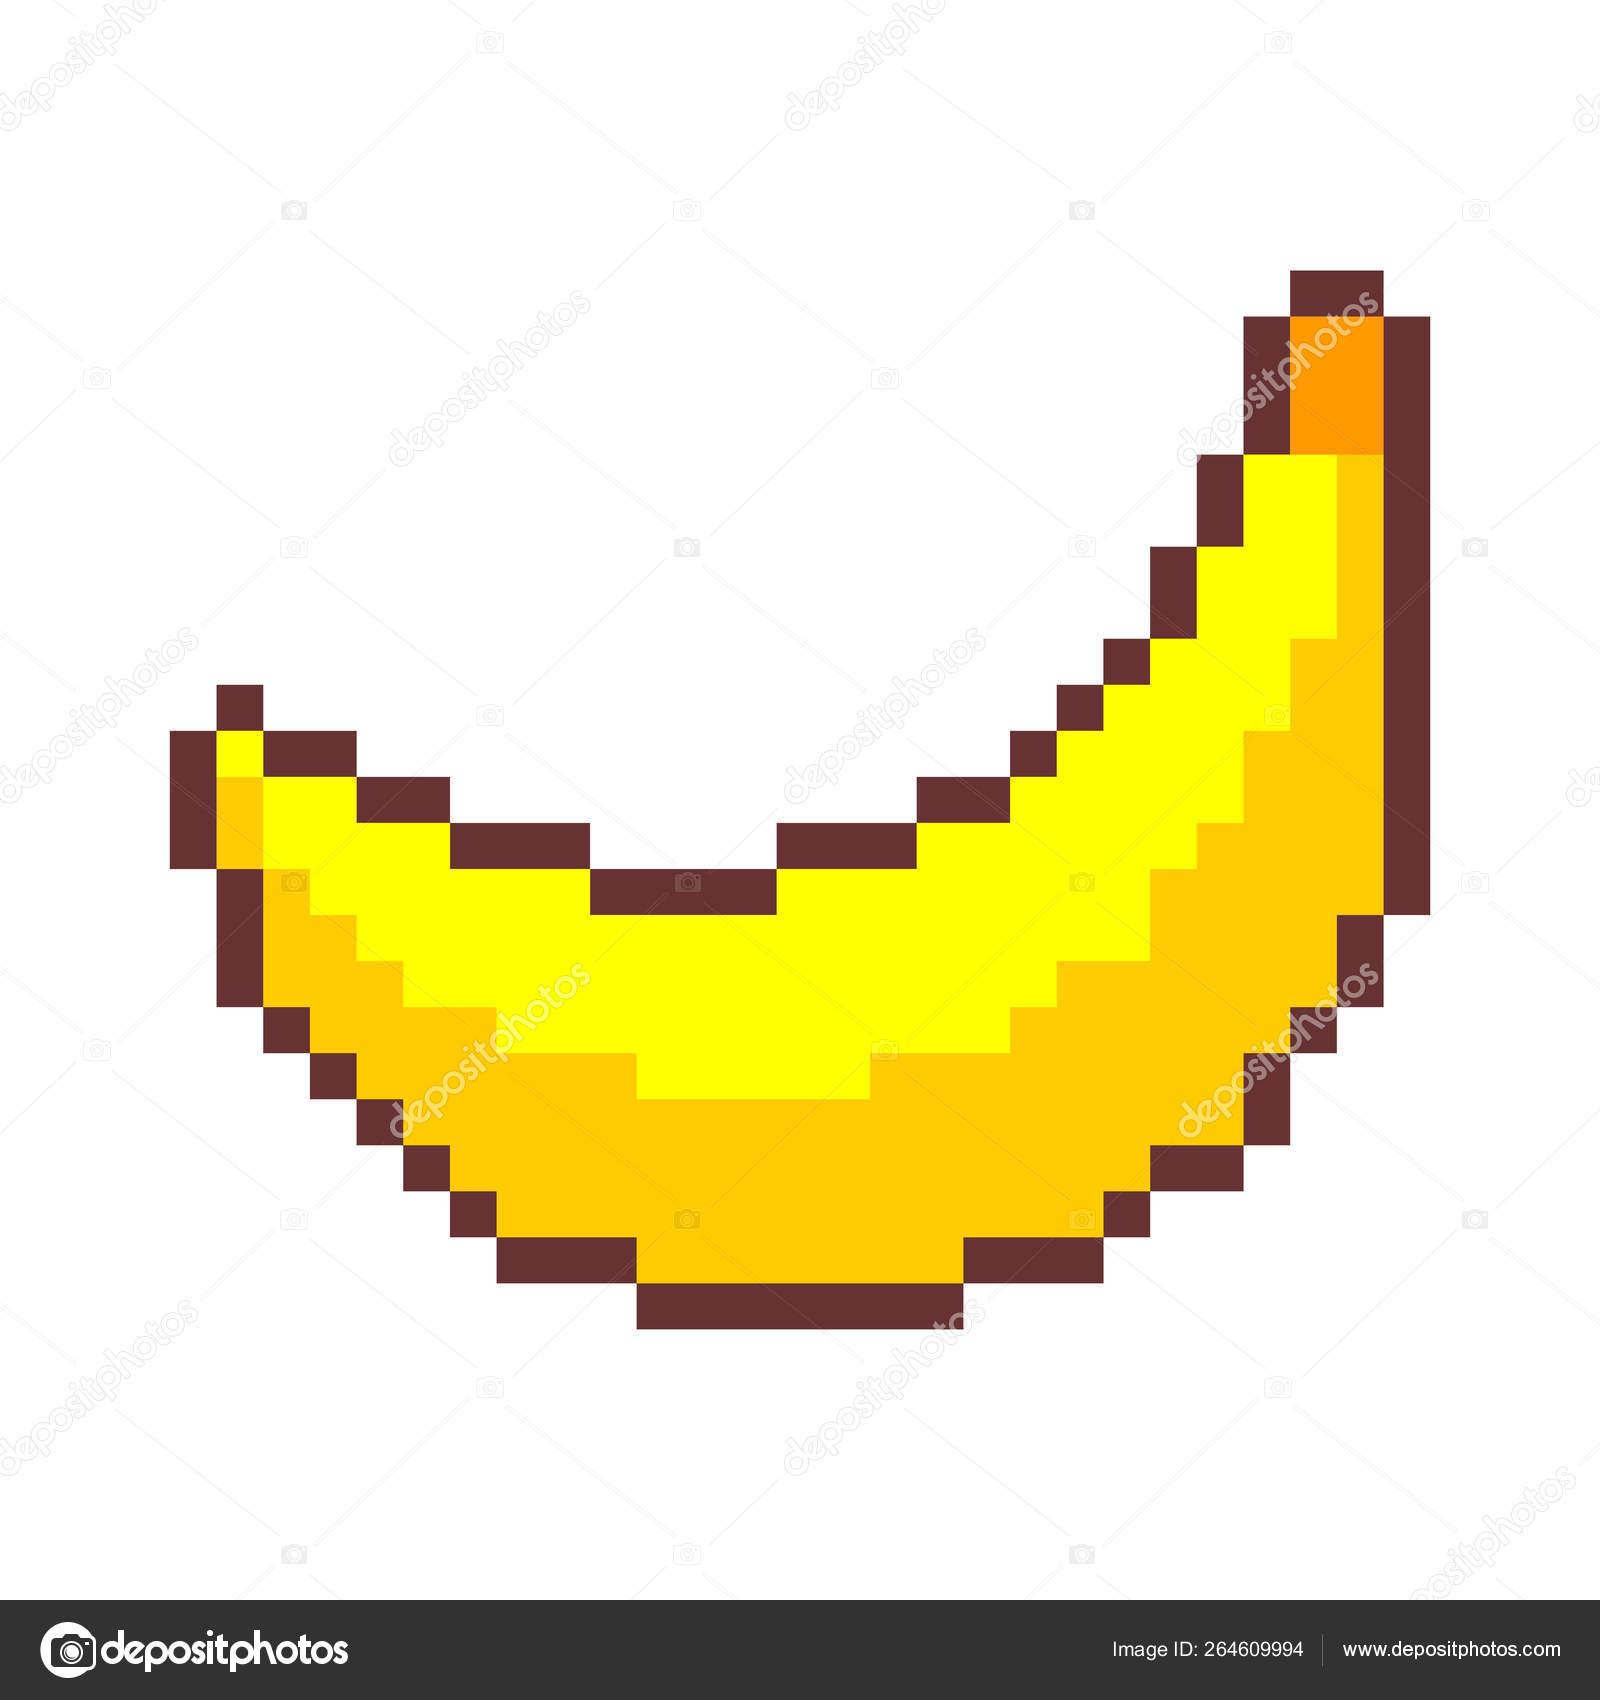 Banana Pixel Art Fruit Pixelated Old Game Graphics 8 Bit Big Stock Vector C Maryvalery 264609994